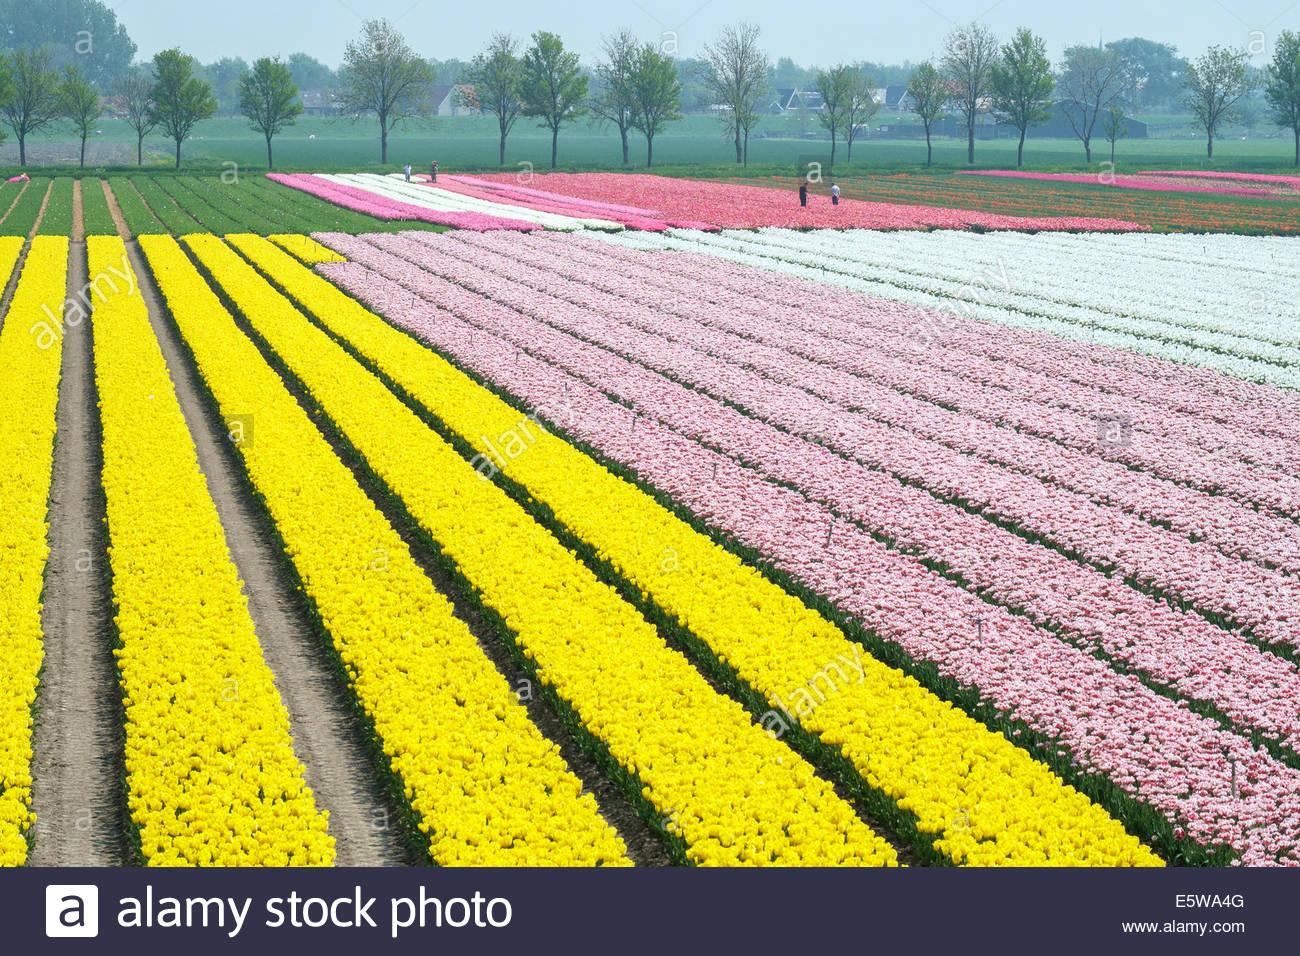 Men working in colorful tulip fields near village of Ursem, North Holland, Netherlands - Stock Image